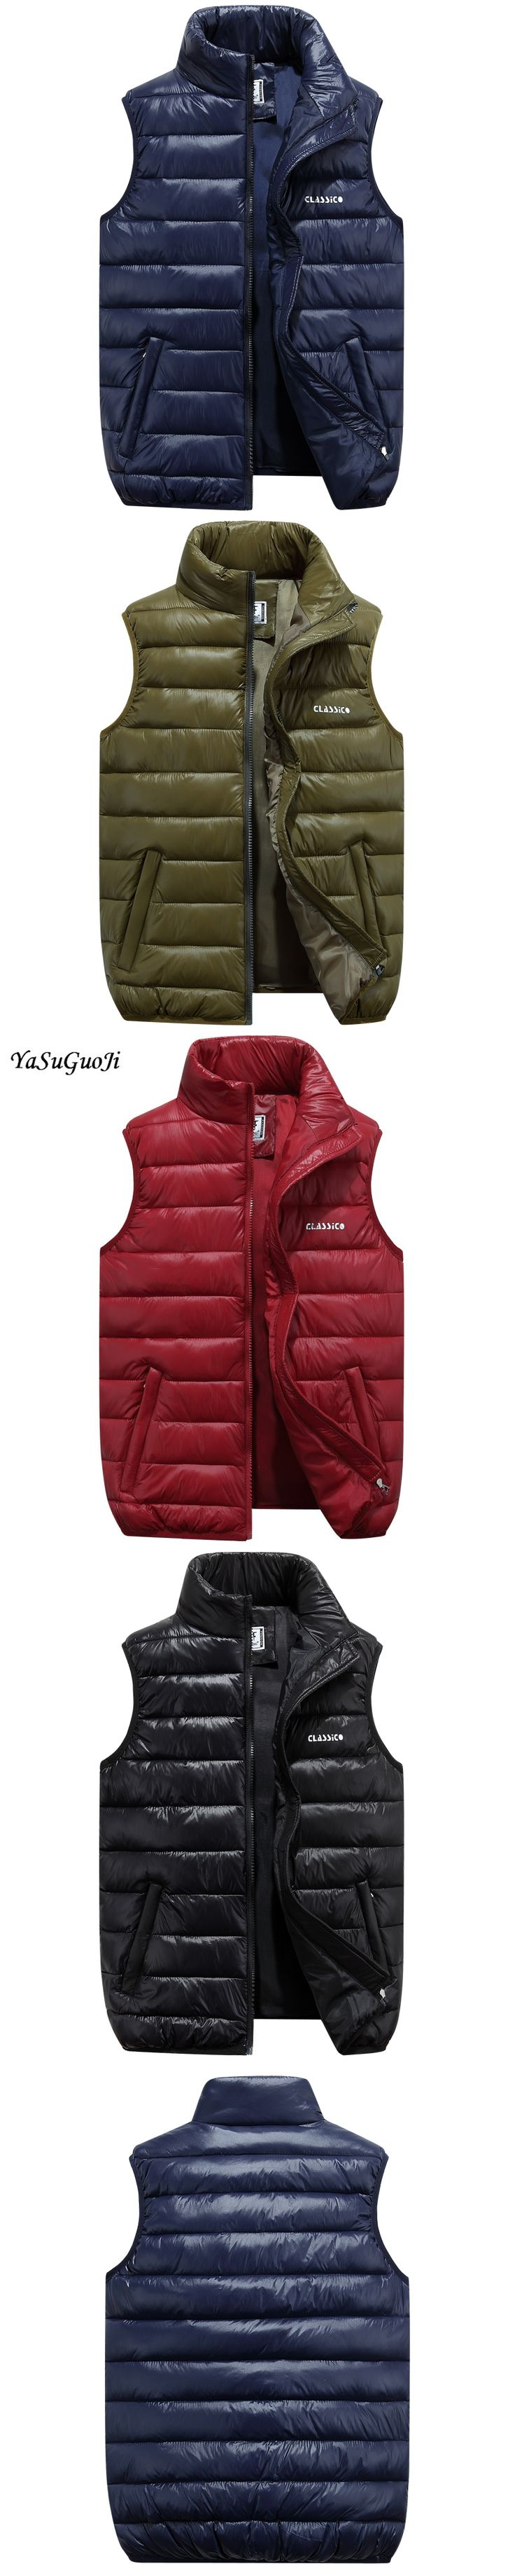 Fashion pure color stand collar cotton padded vest men thicken winter cotton down vest jacket chaleco hombre men's clothing MJ4